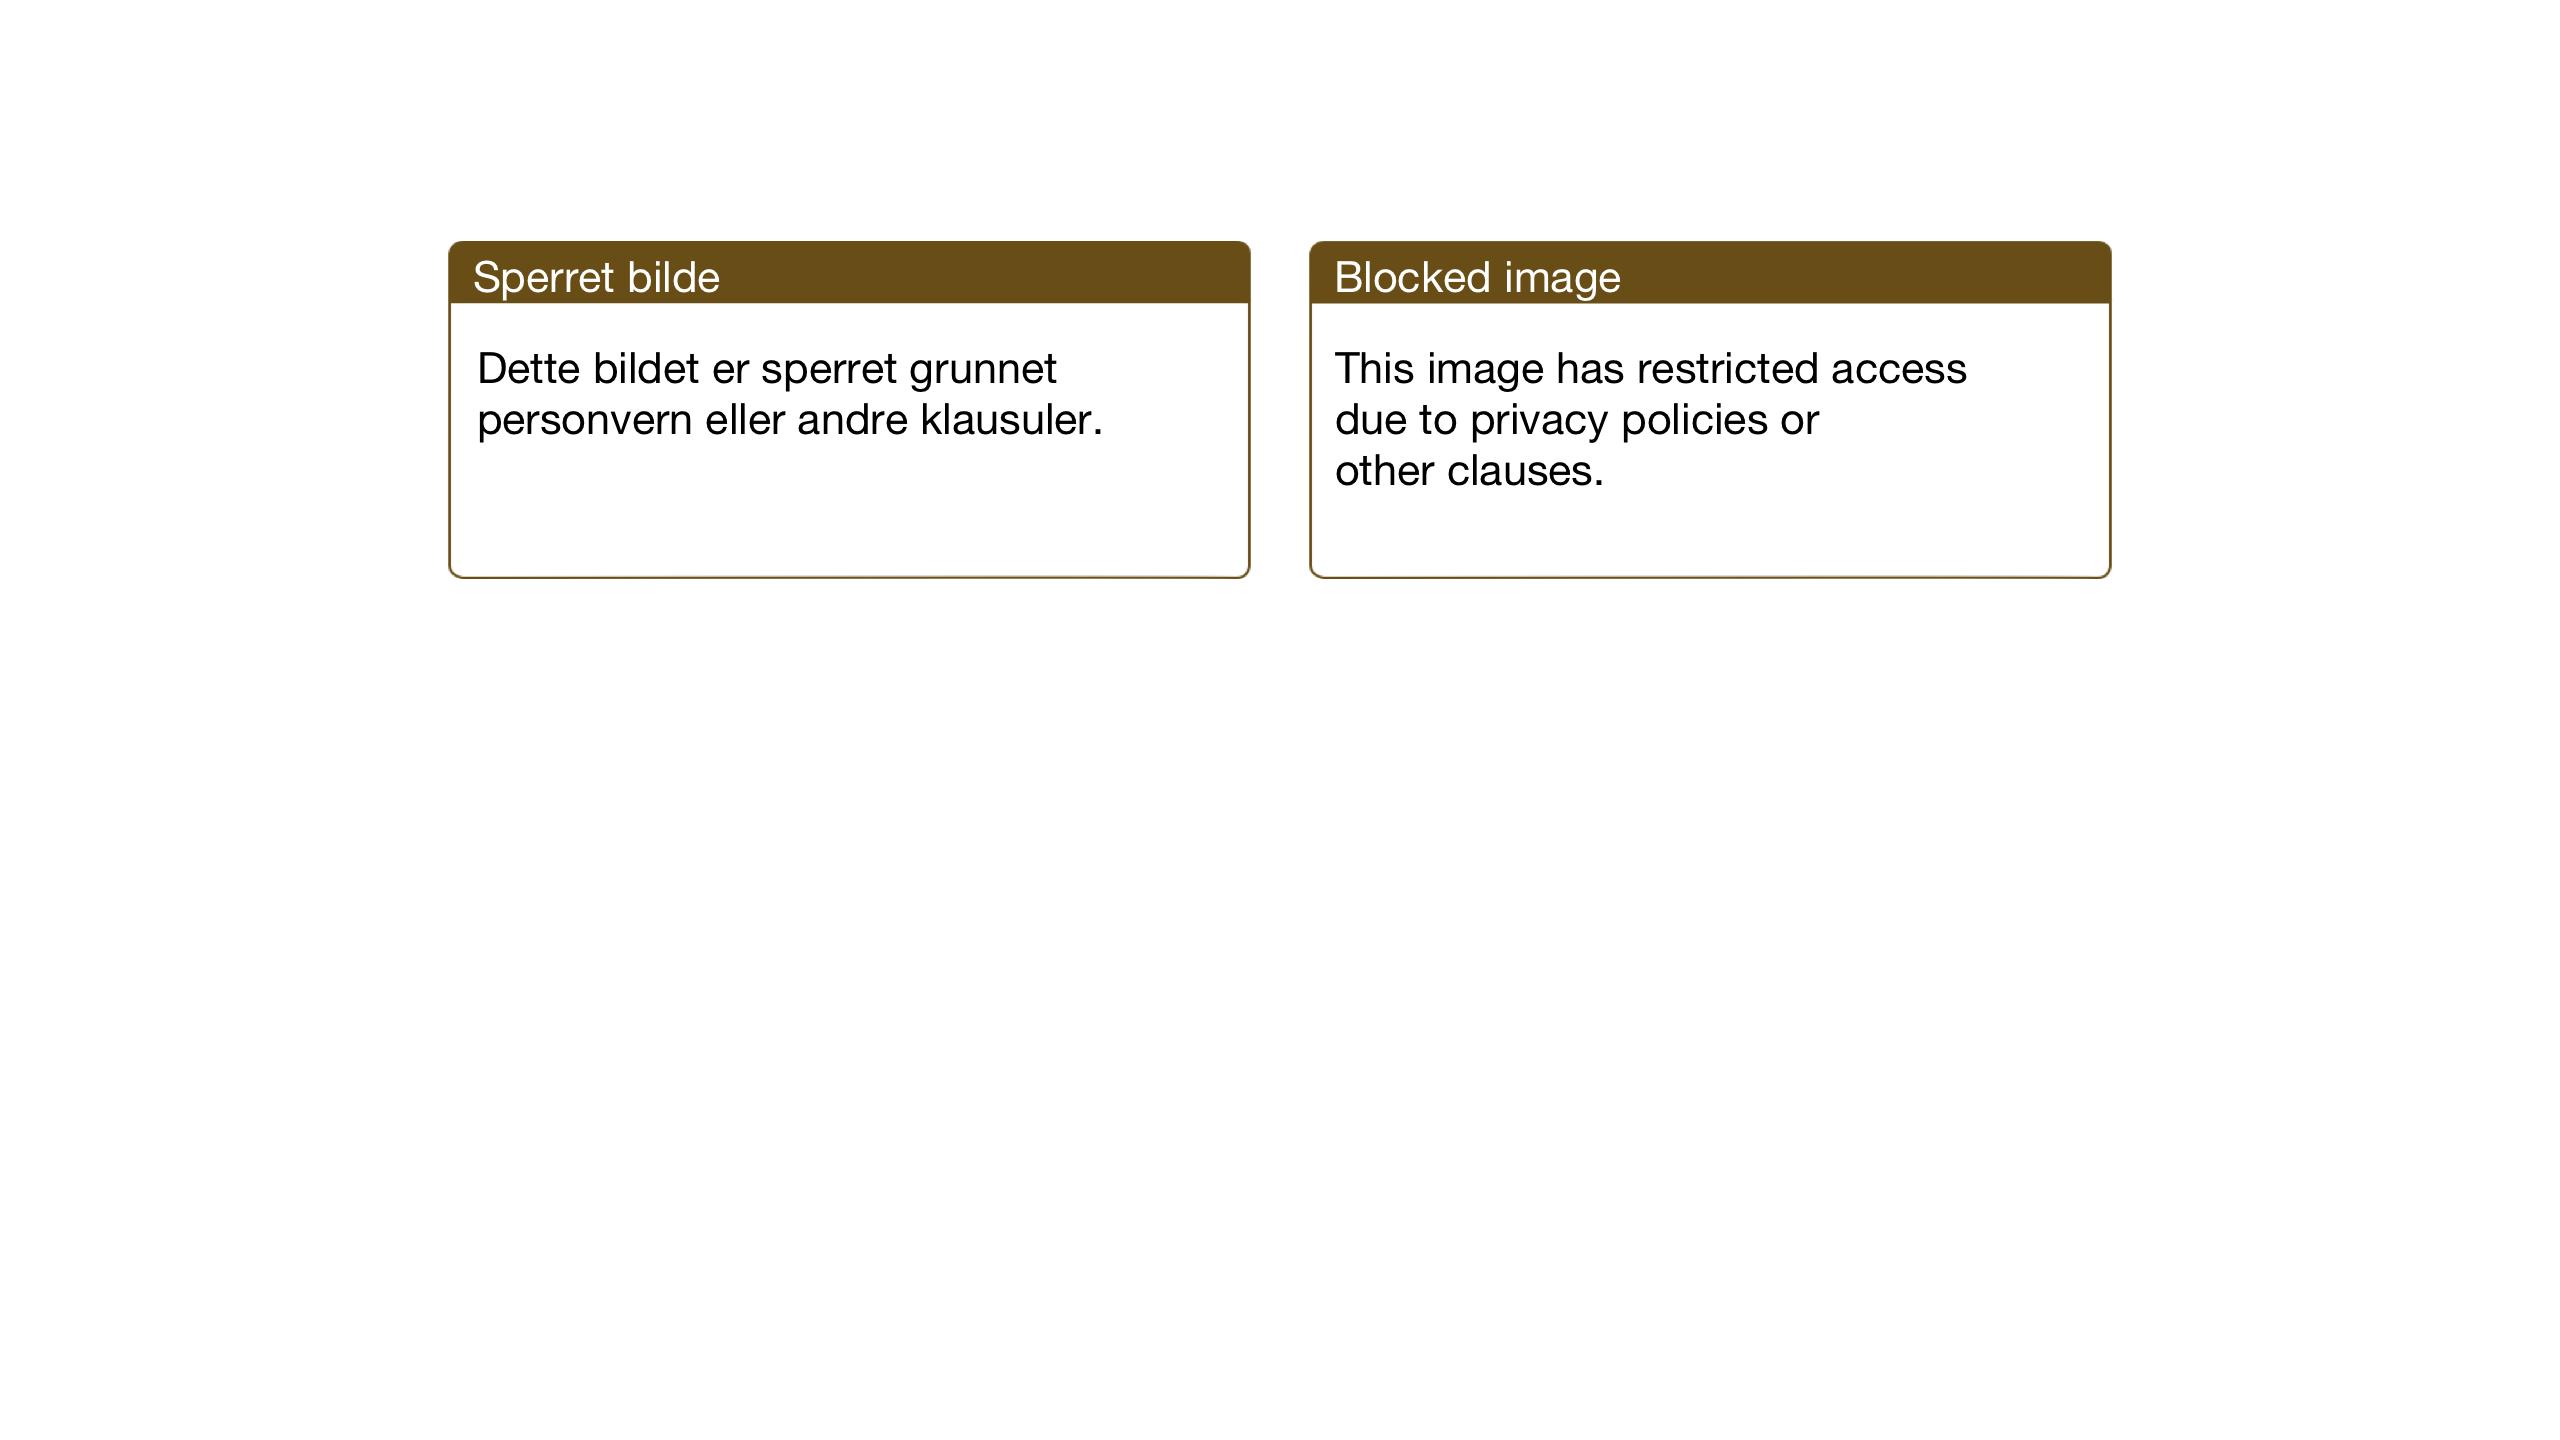 SAT, Ministerialprotokoller, klokkerbøker og fødselsregistre - Nordland, 884/L1194: Ministerialbok nr. 884A02, 1906-1937, s. 70